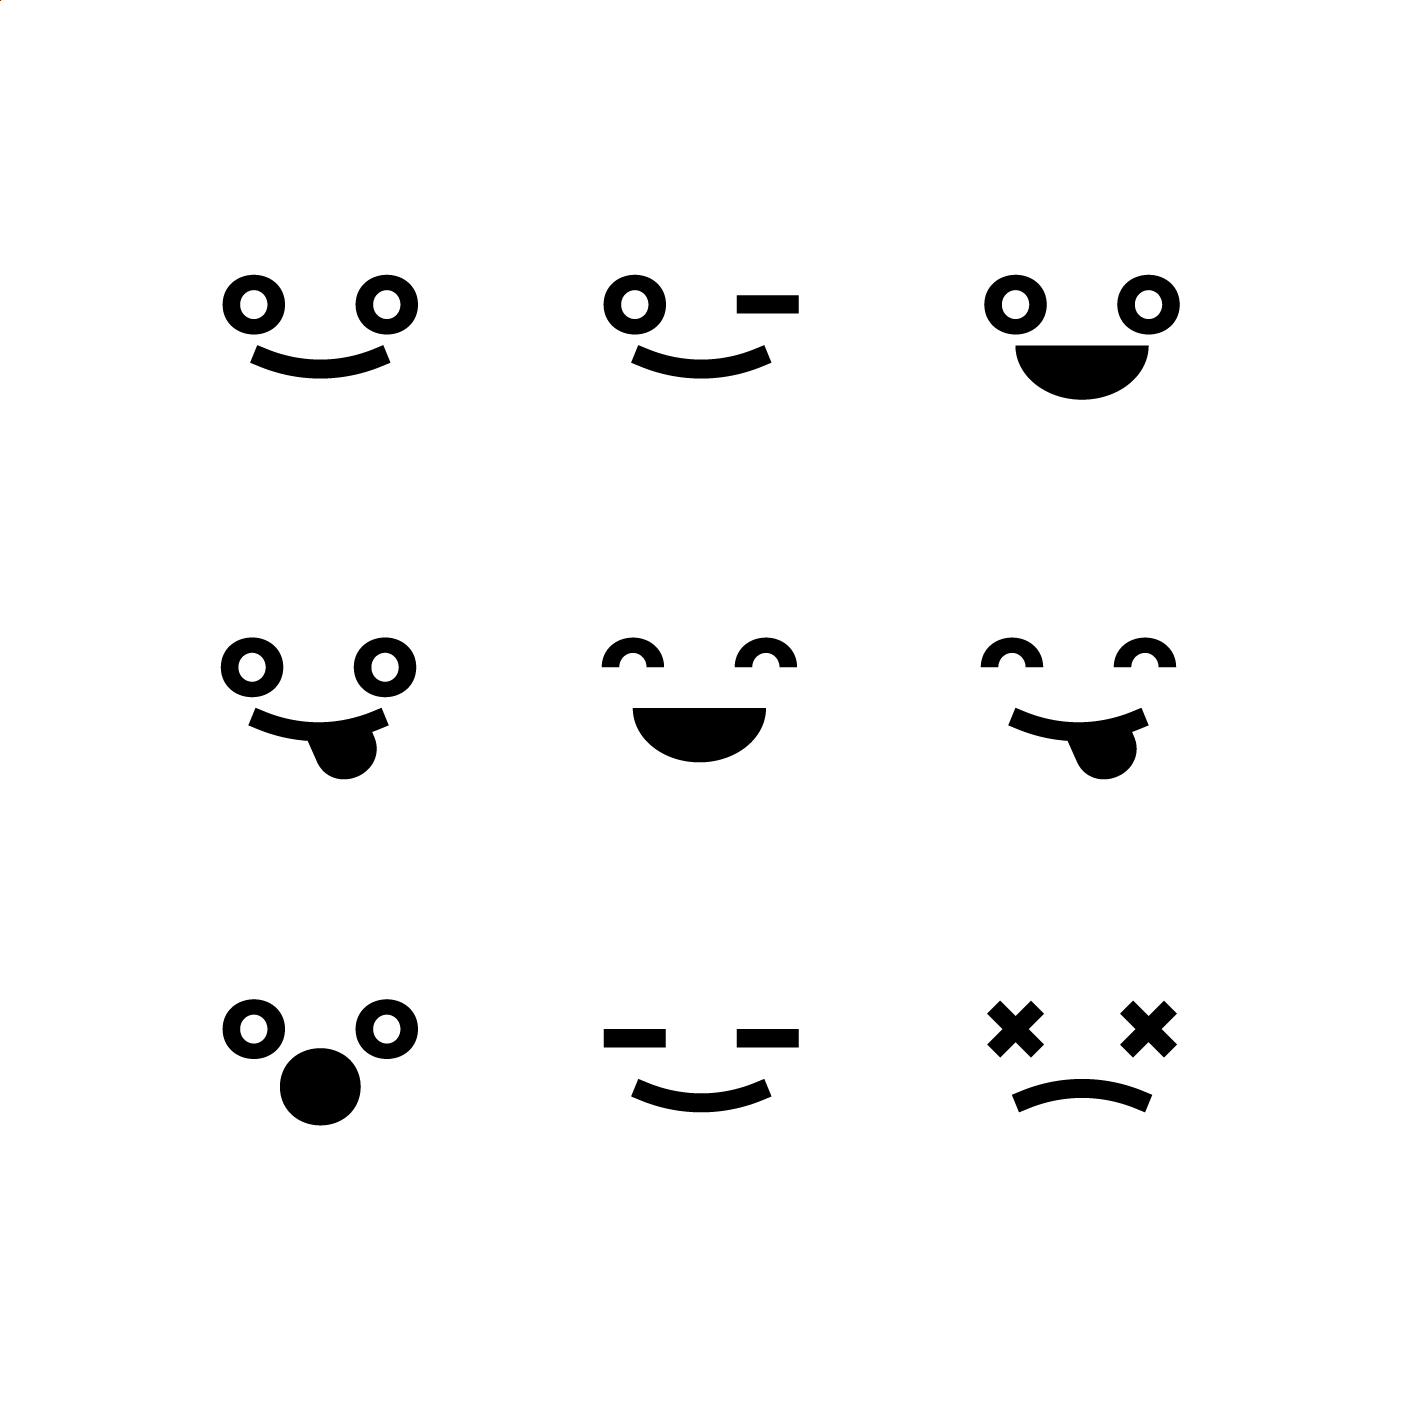 nat roco expressions